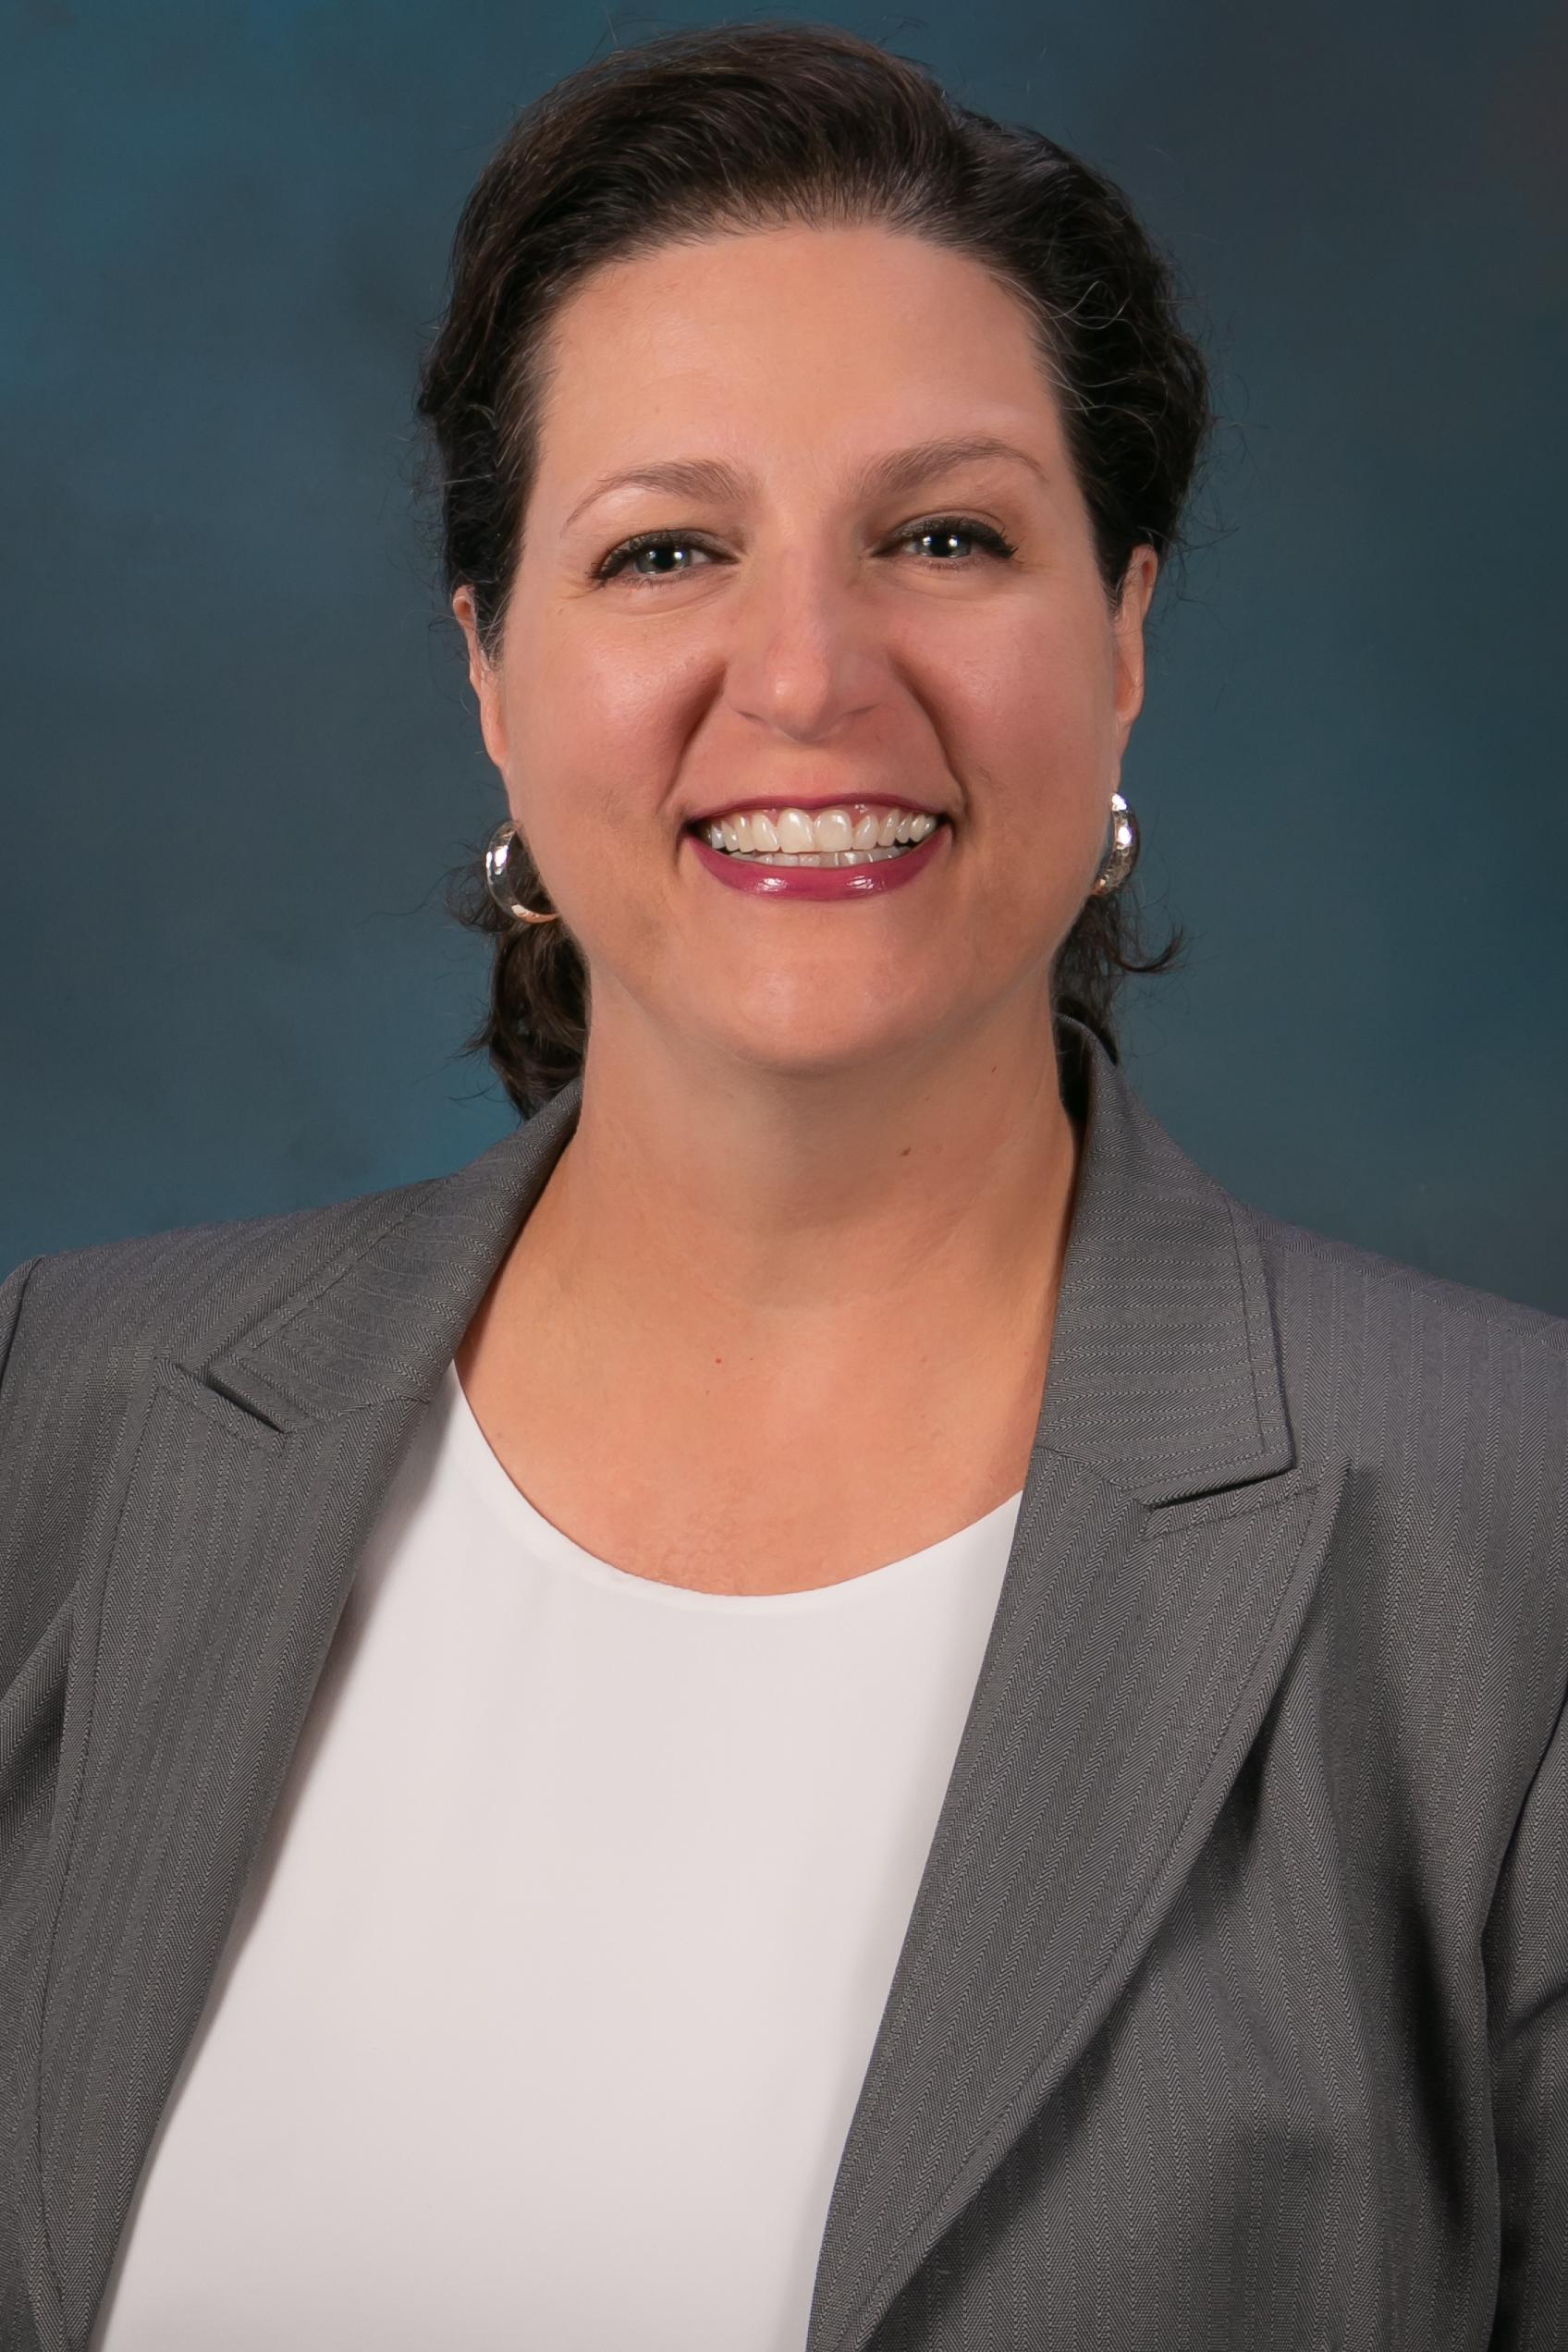 Gina Sanchez, Marina Superintendent